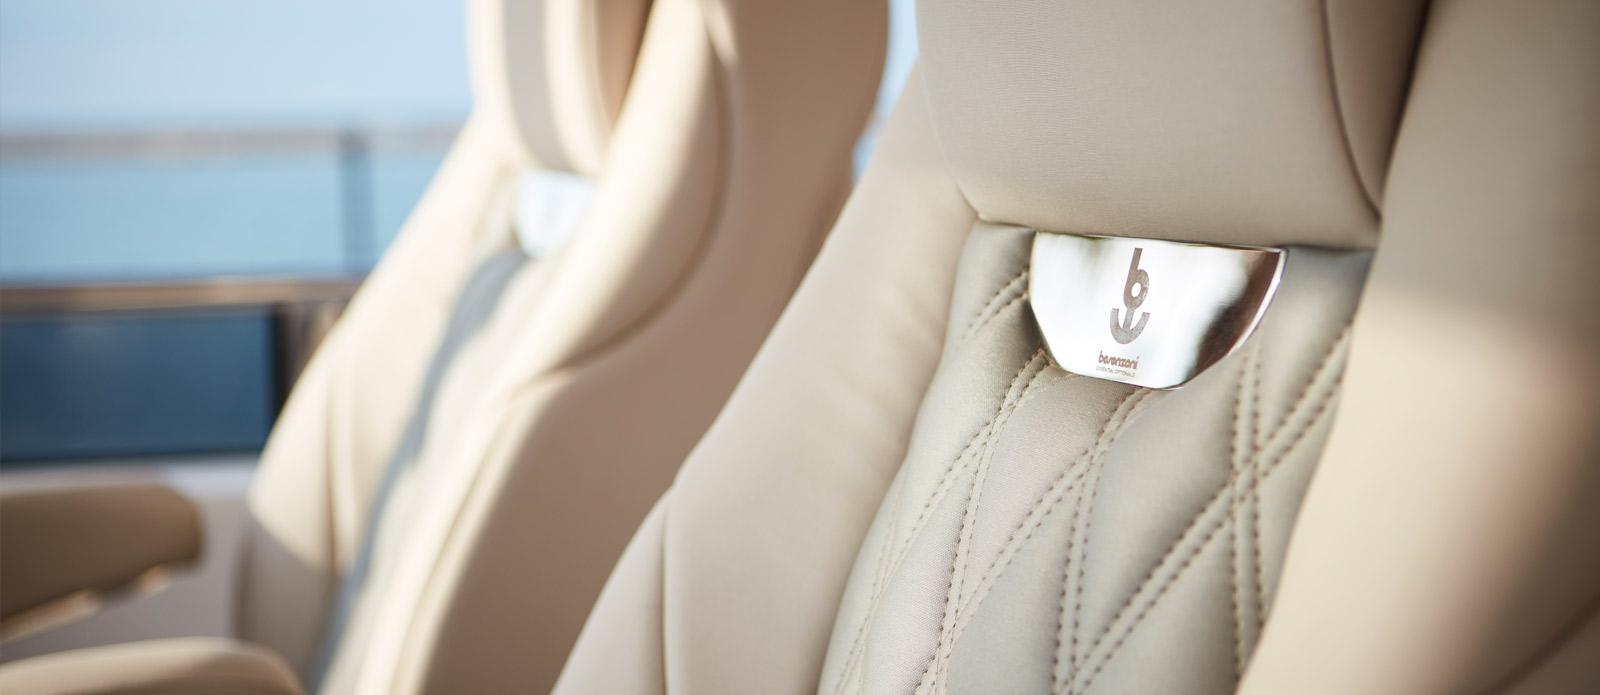 Princess 30 Metre Yacht Bandazul - Helm Seats